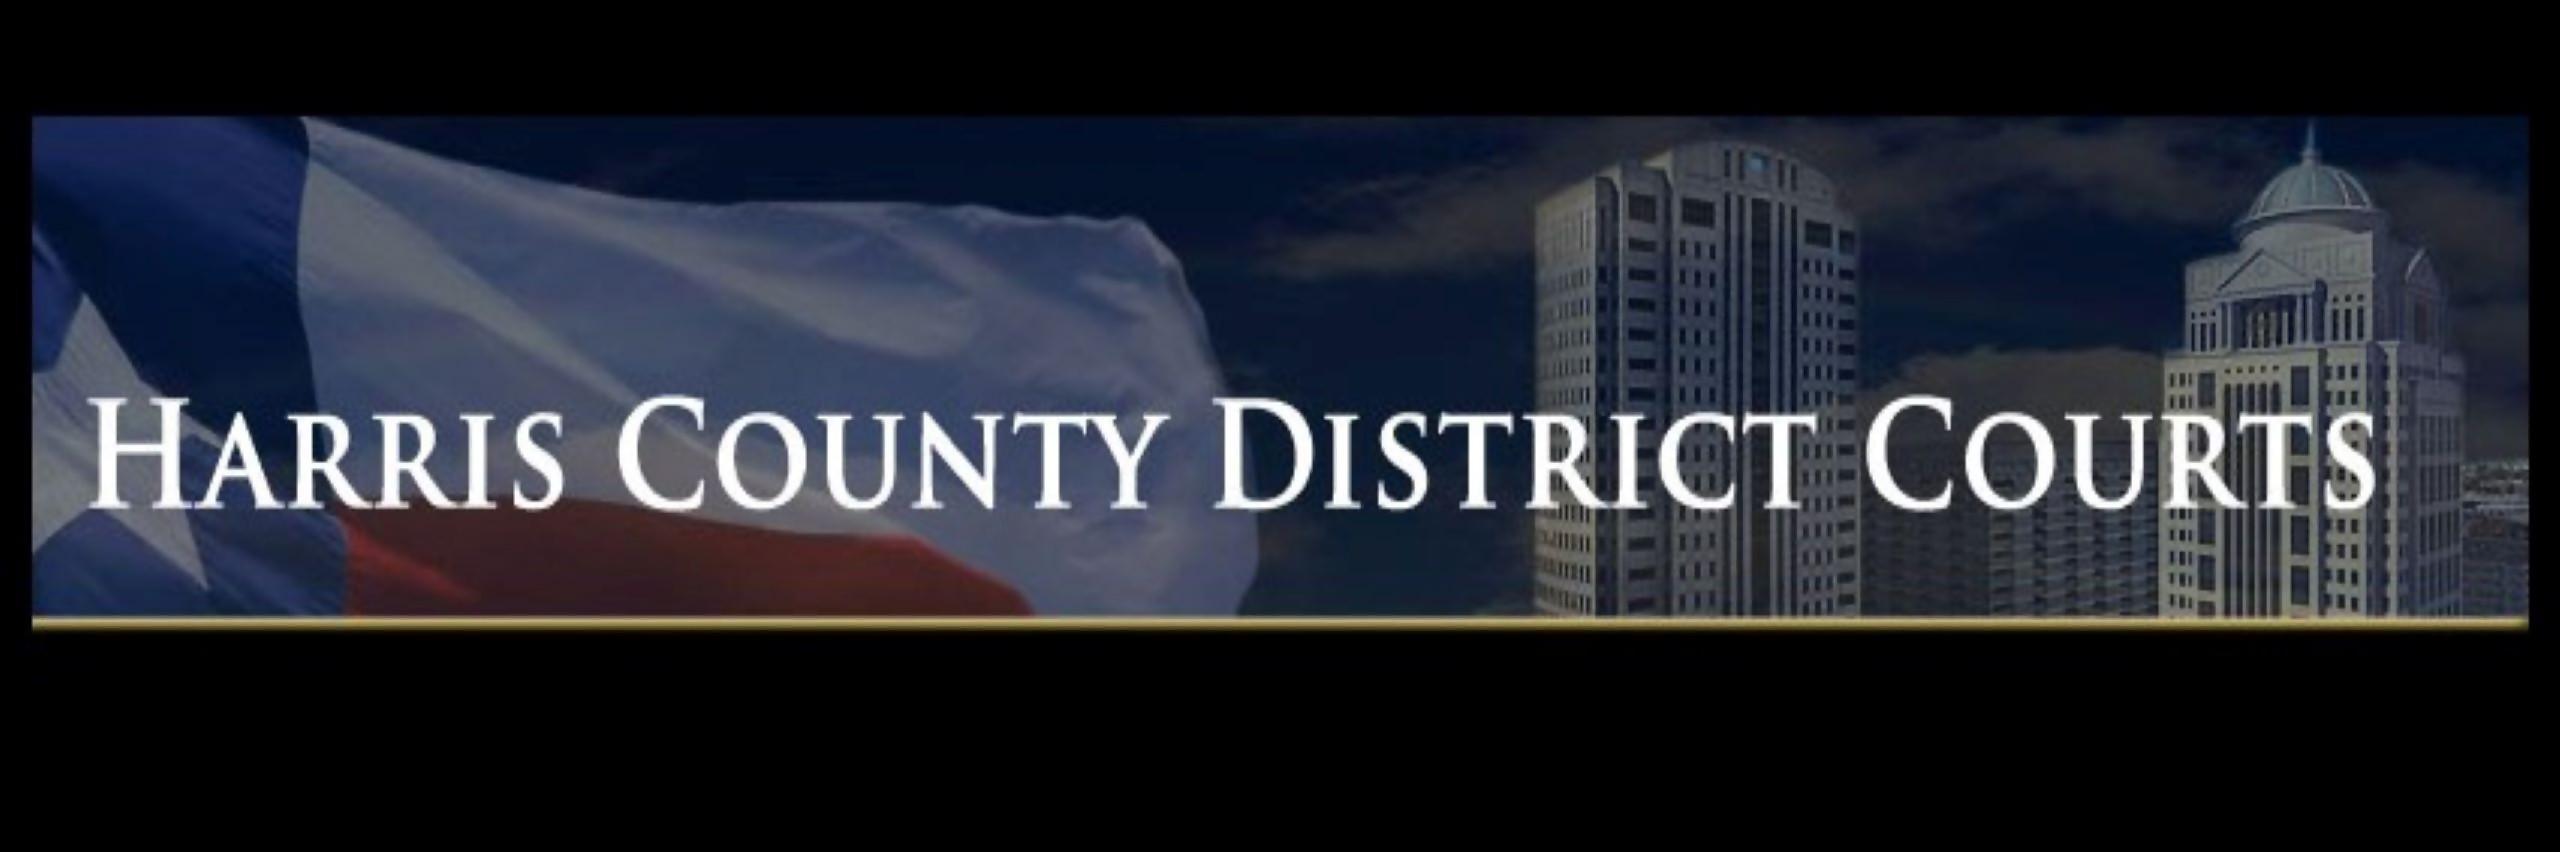 338th District Court - Live Stream